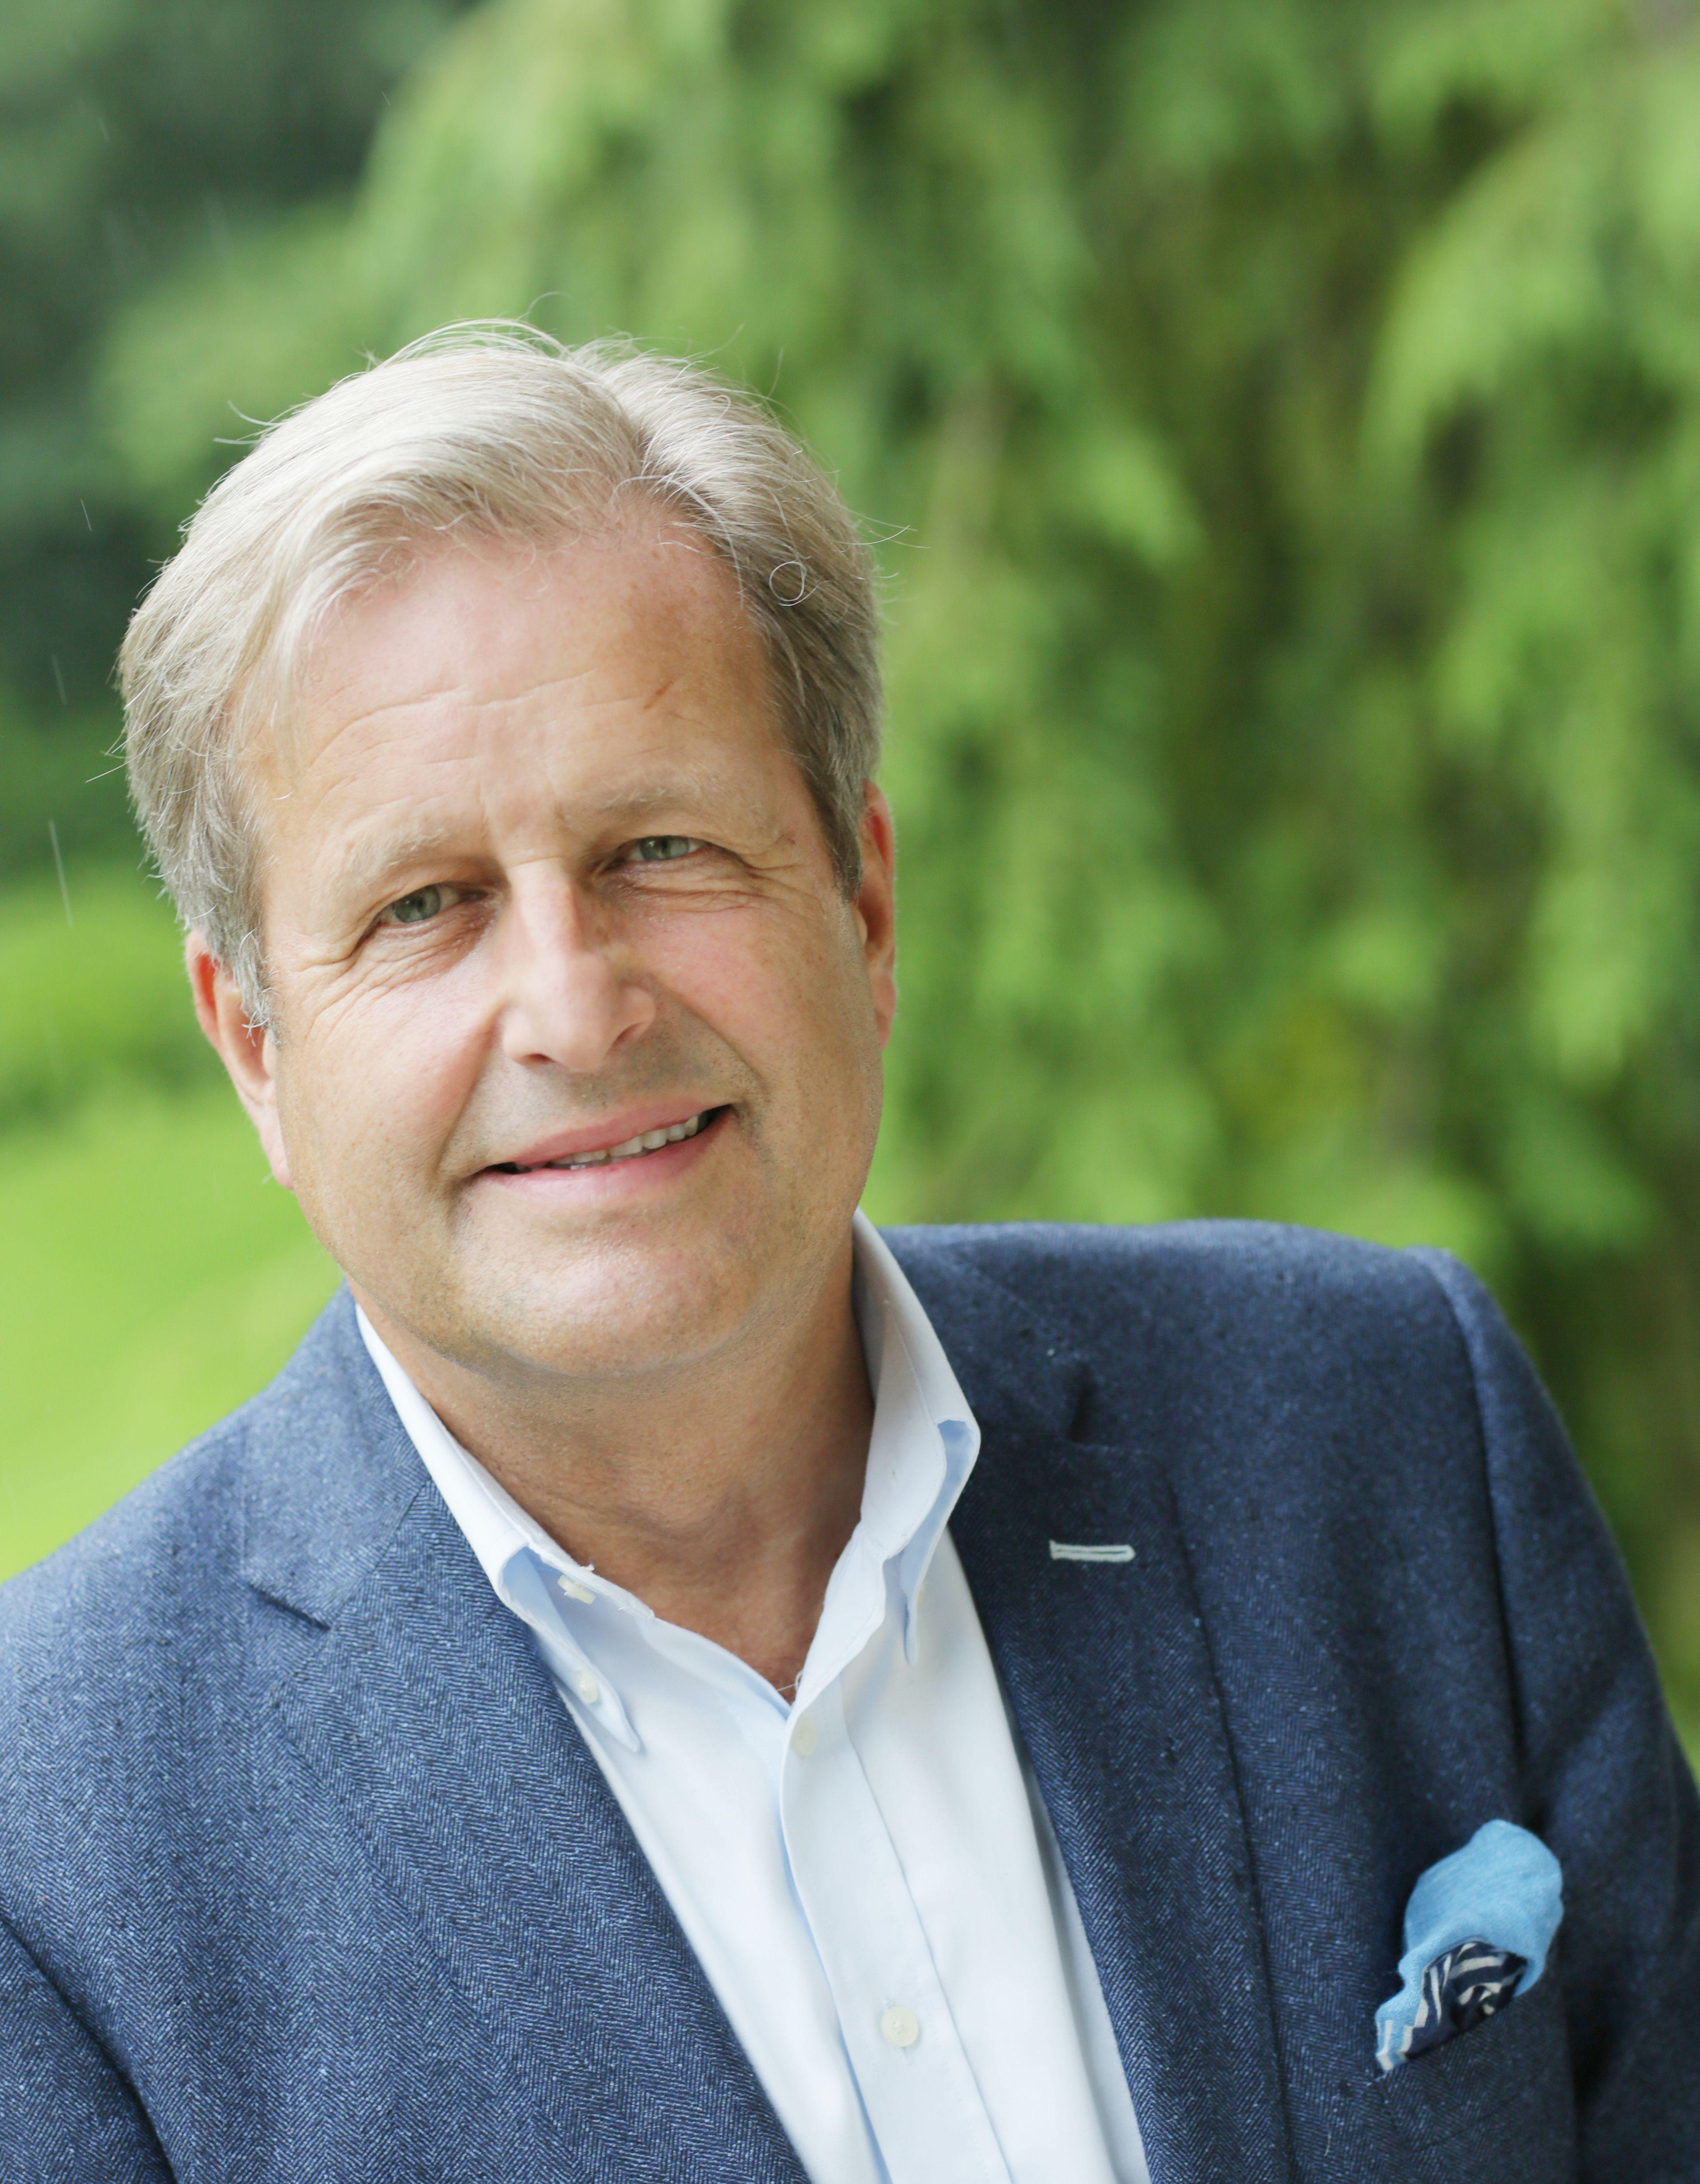 Stephen Brenninkmeijer Willows Investments UK Founder Principal